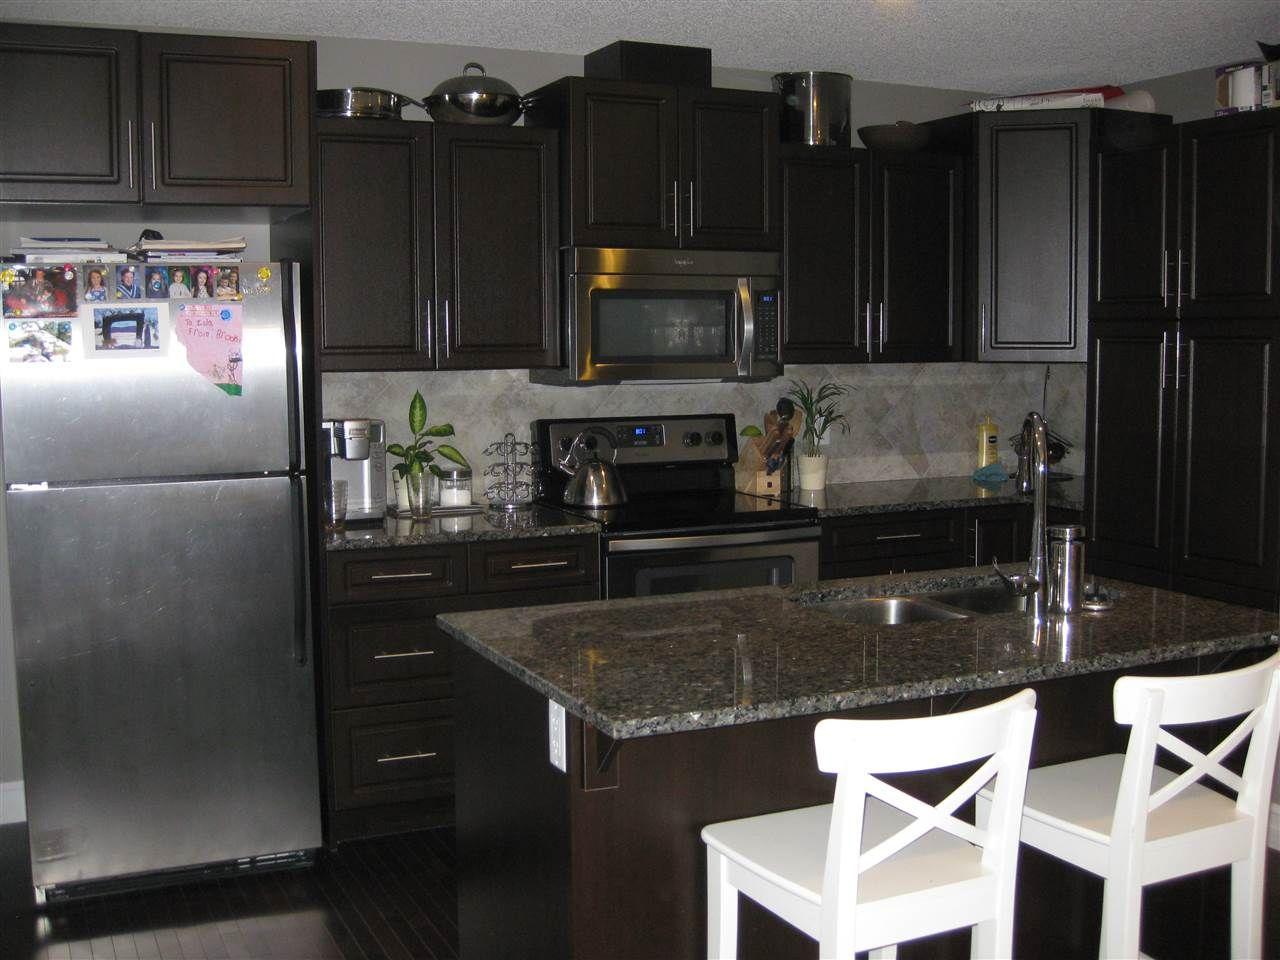 Photo 13: Photos: #41 3625 144 AV NW in Edmonton: Zone 35 Townhouse for sale : MLS®# E4016087